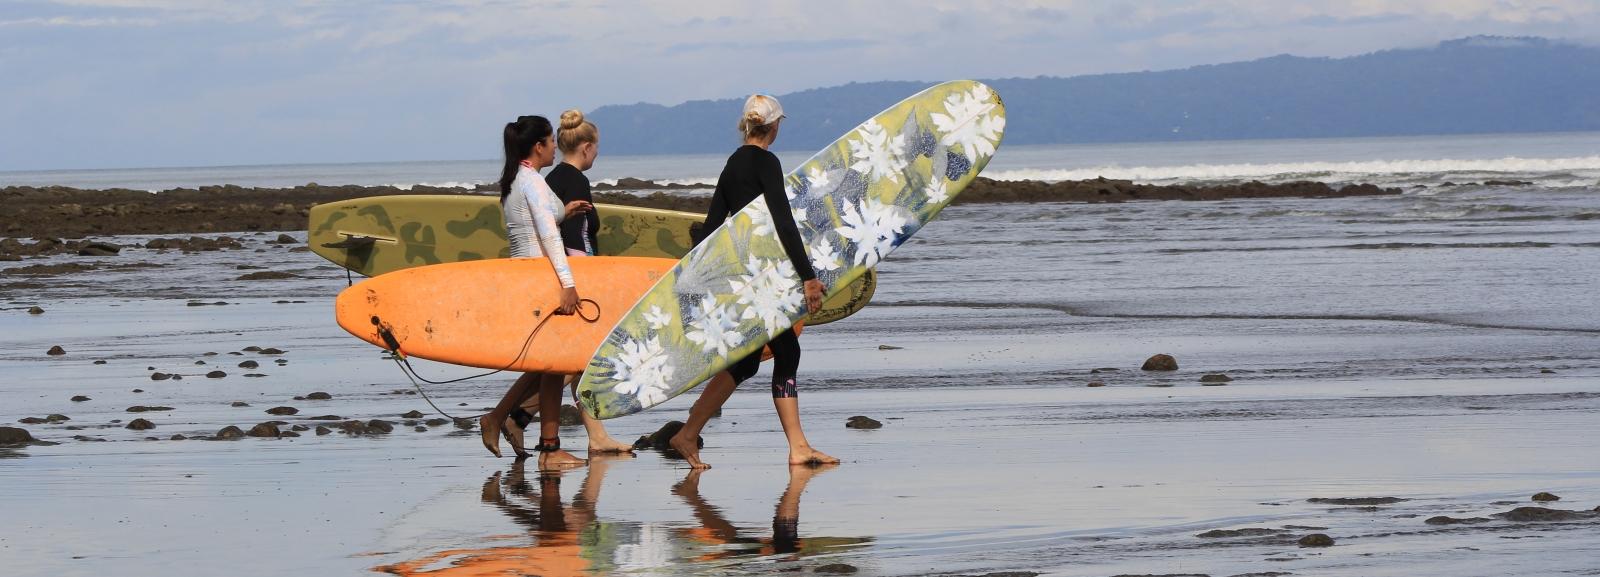 holly beck, surf coach, Pavones, Costa Rica, women,